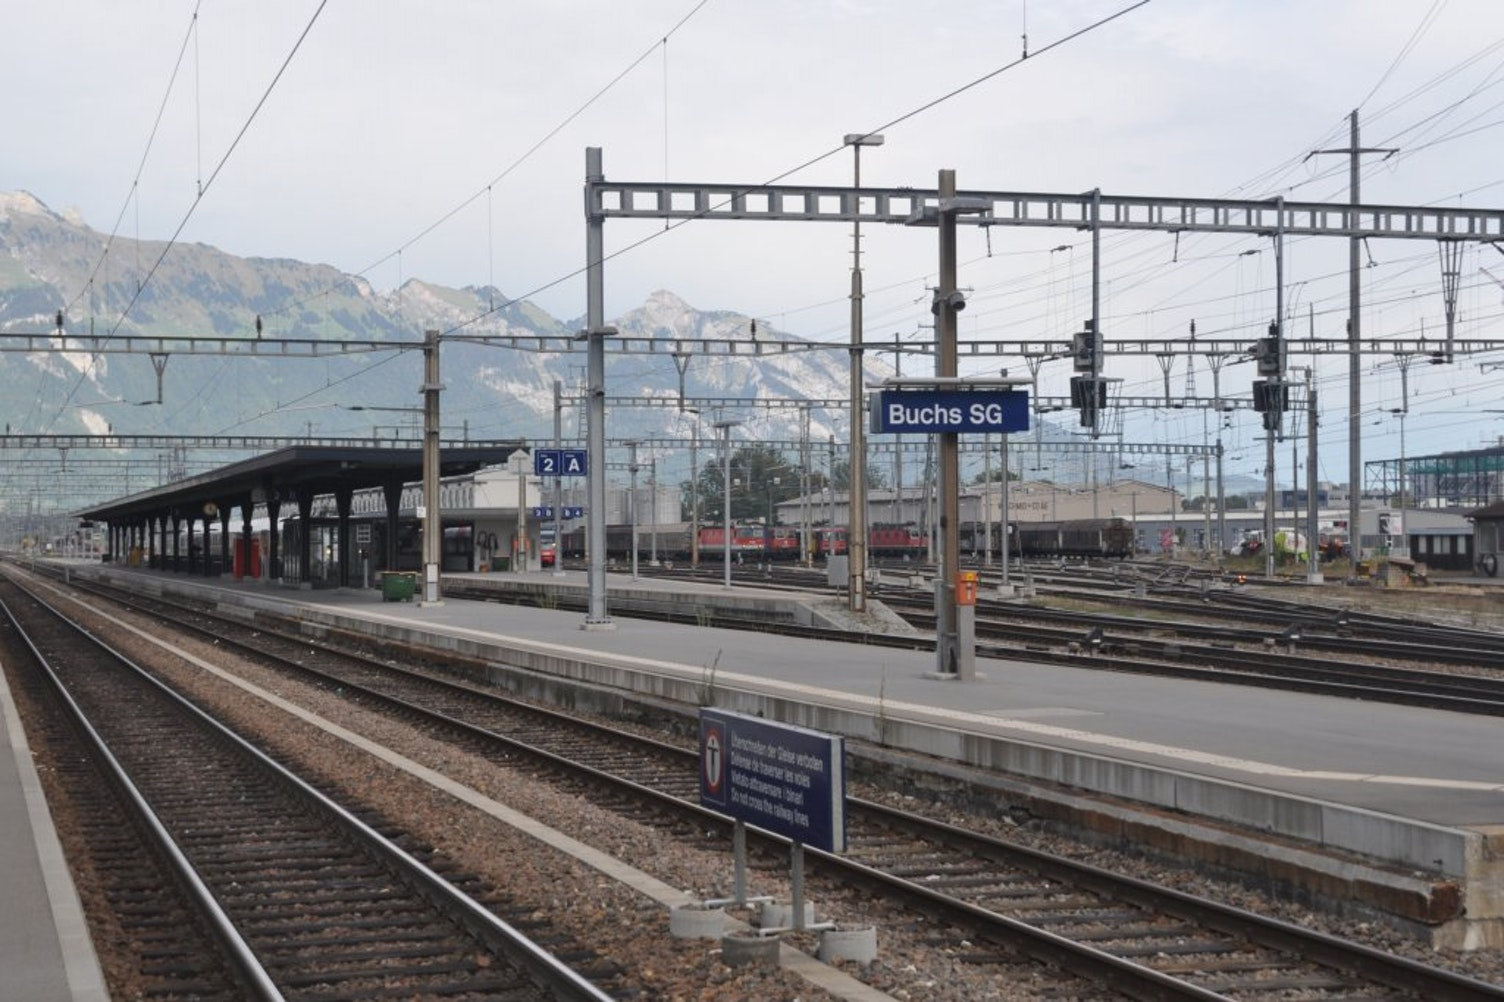 Bahnhof Buchs